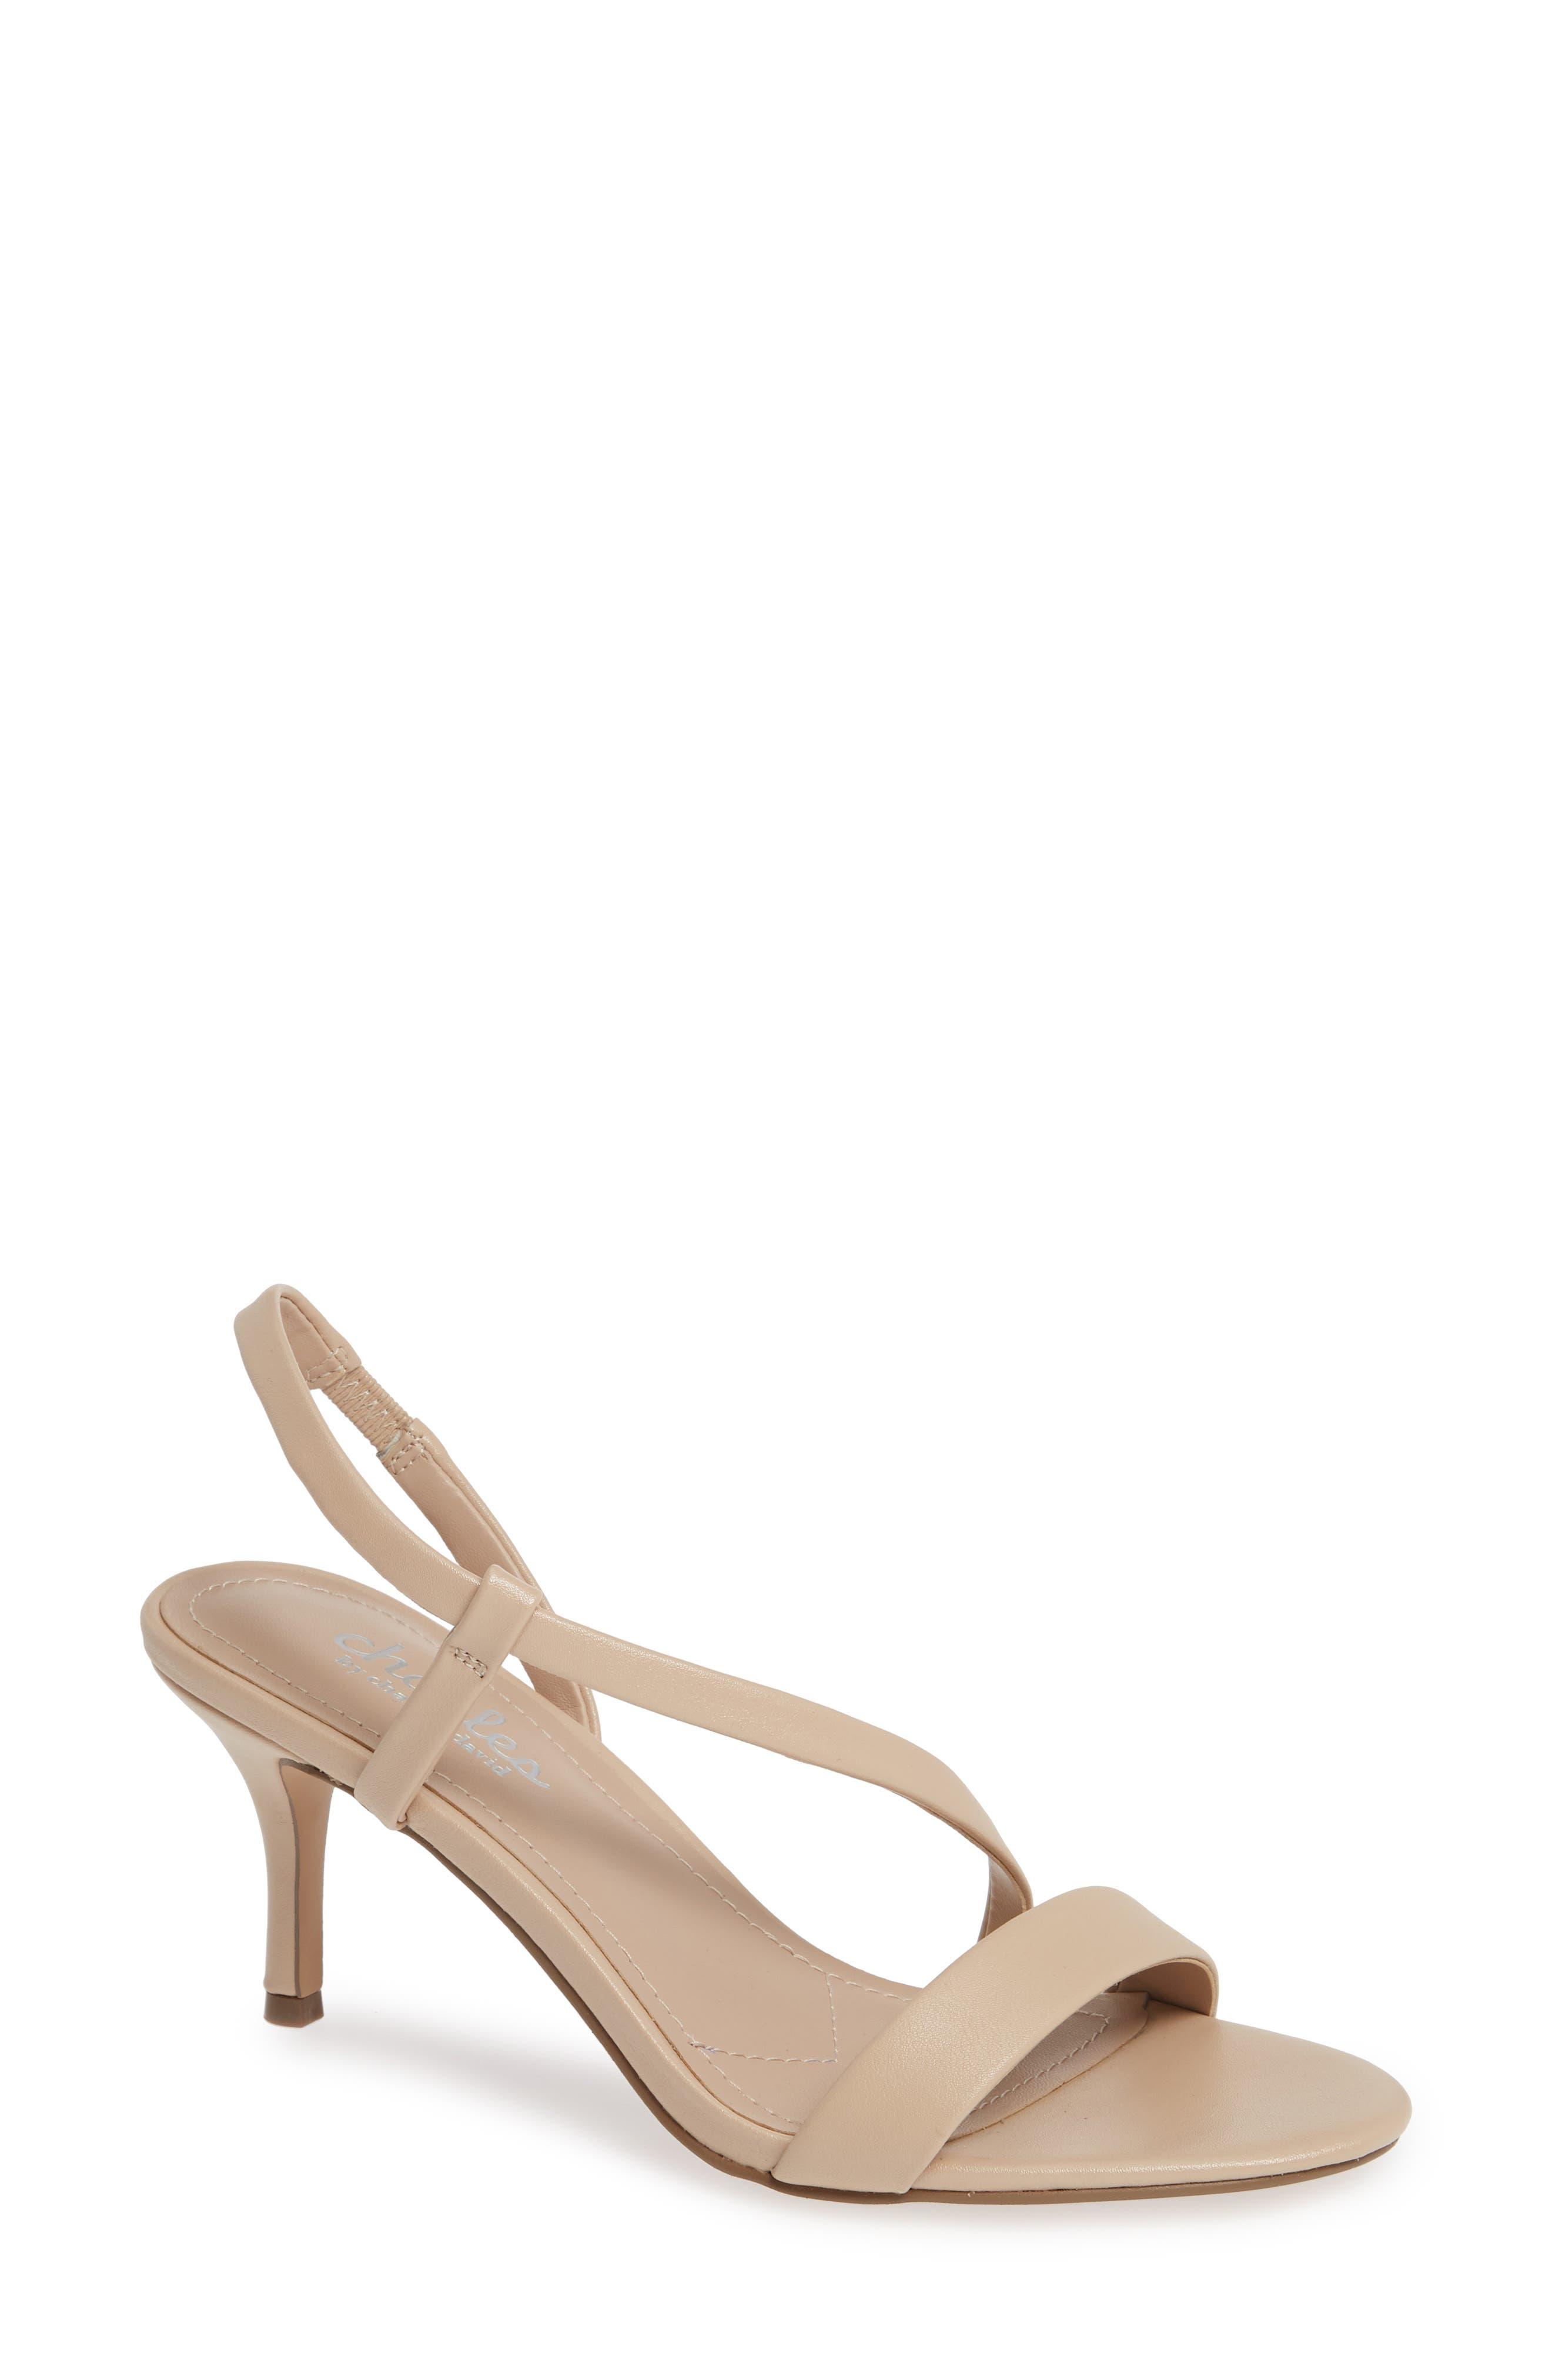 Charles By Charles David Bermuda Asymmetrical Sandal, Beige